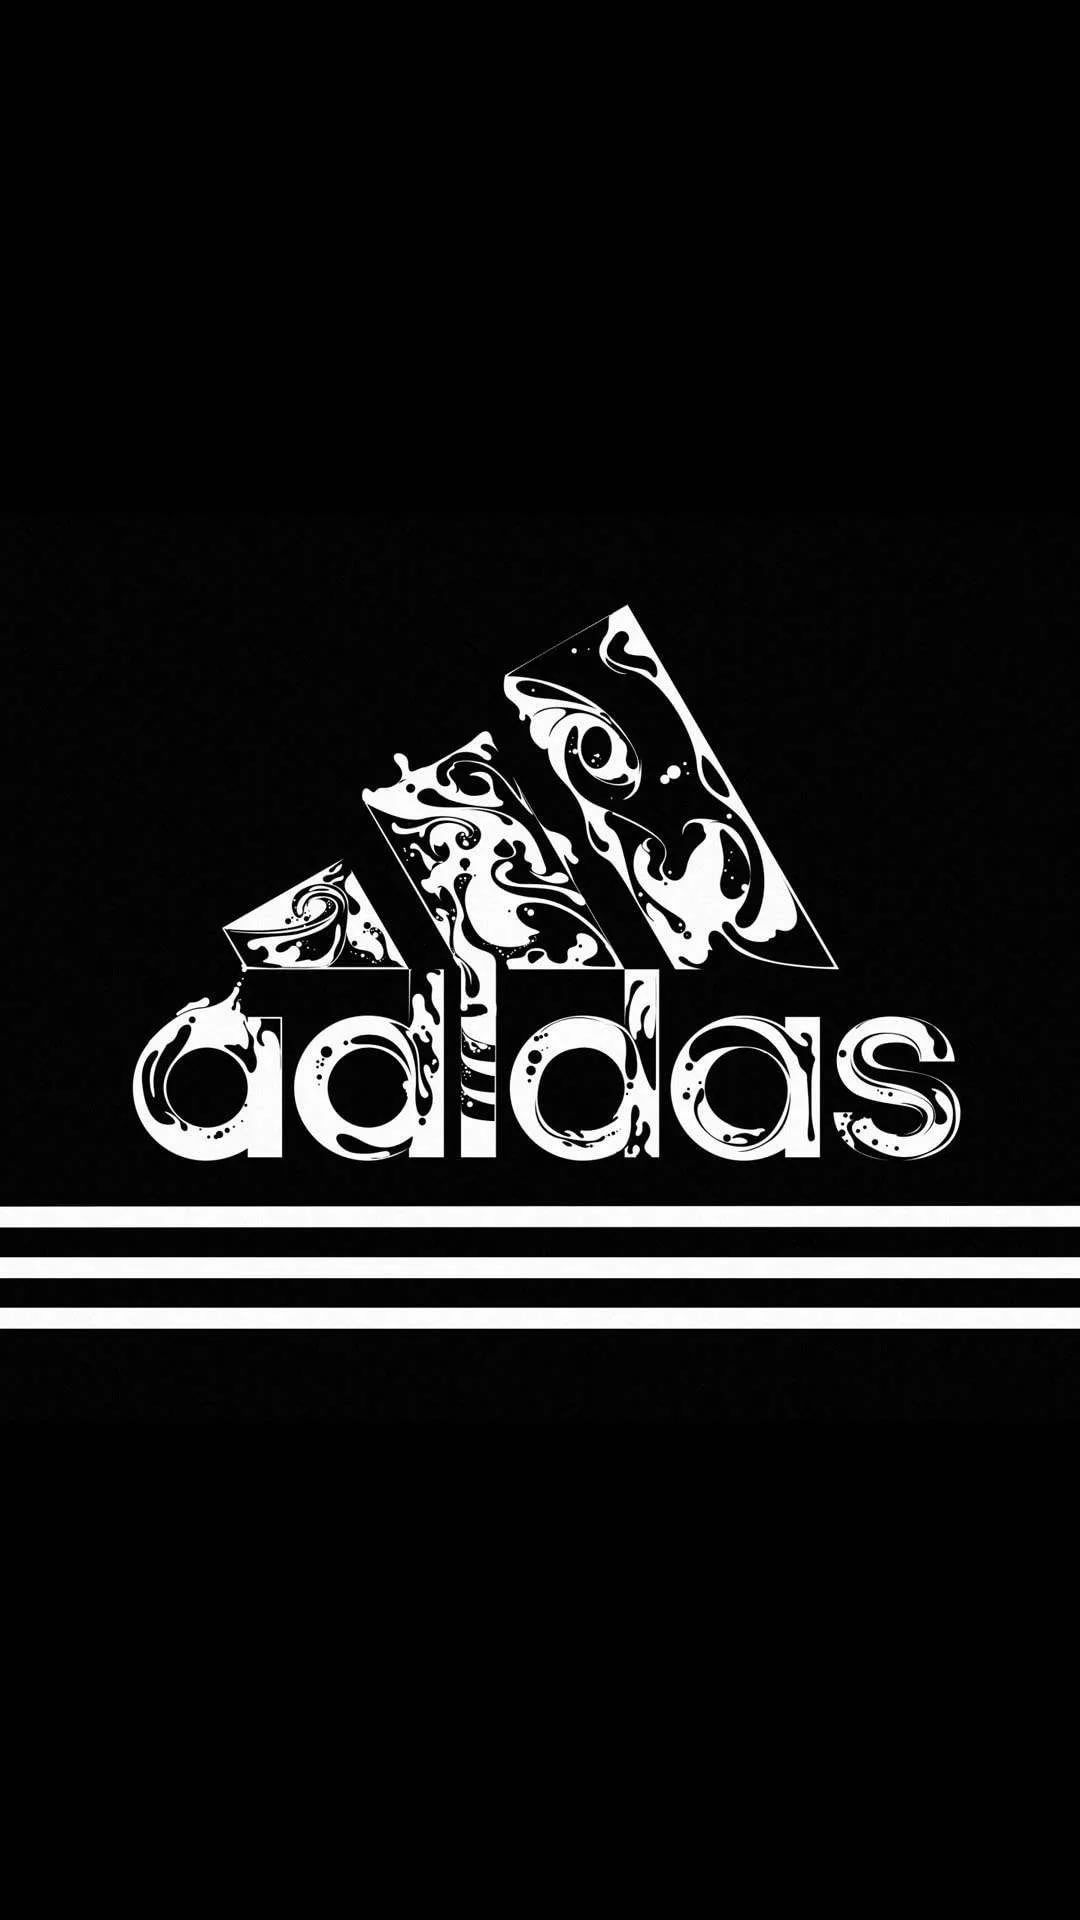 Adidas iPhone hd wallpaper